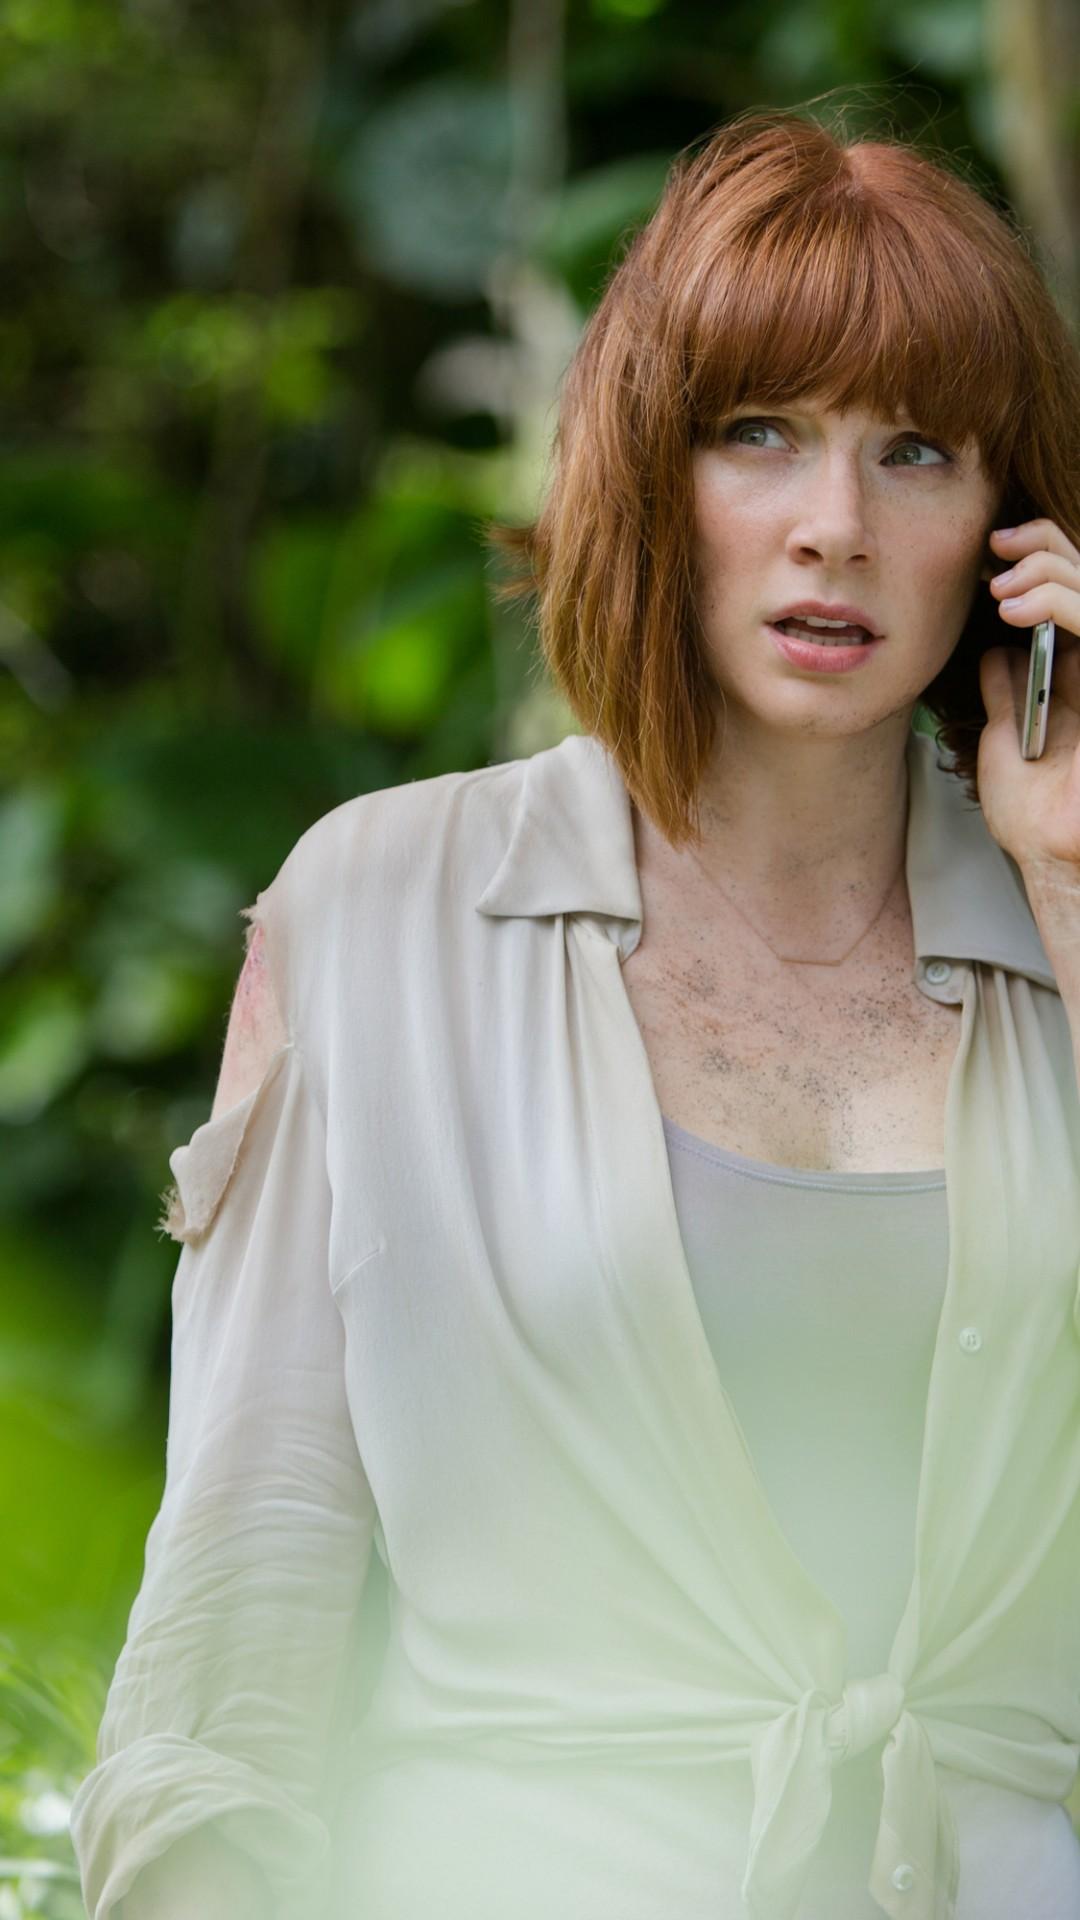 Wallpaper Bryce Dallas Howard Most Popular Celebs Actress Jurassic World Celebrities 6234